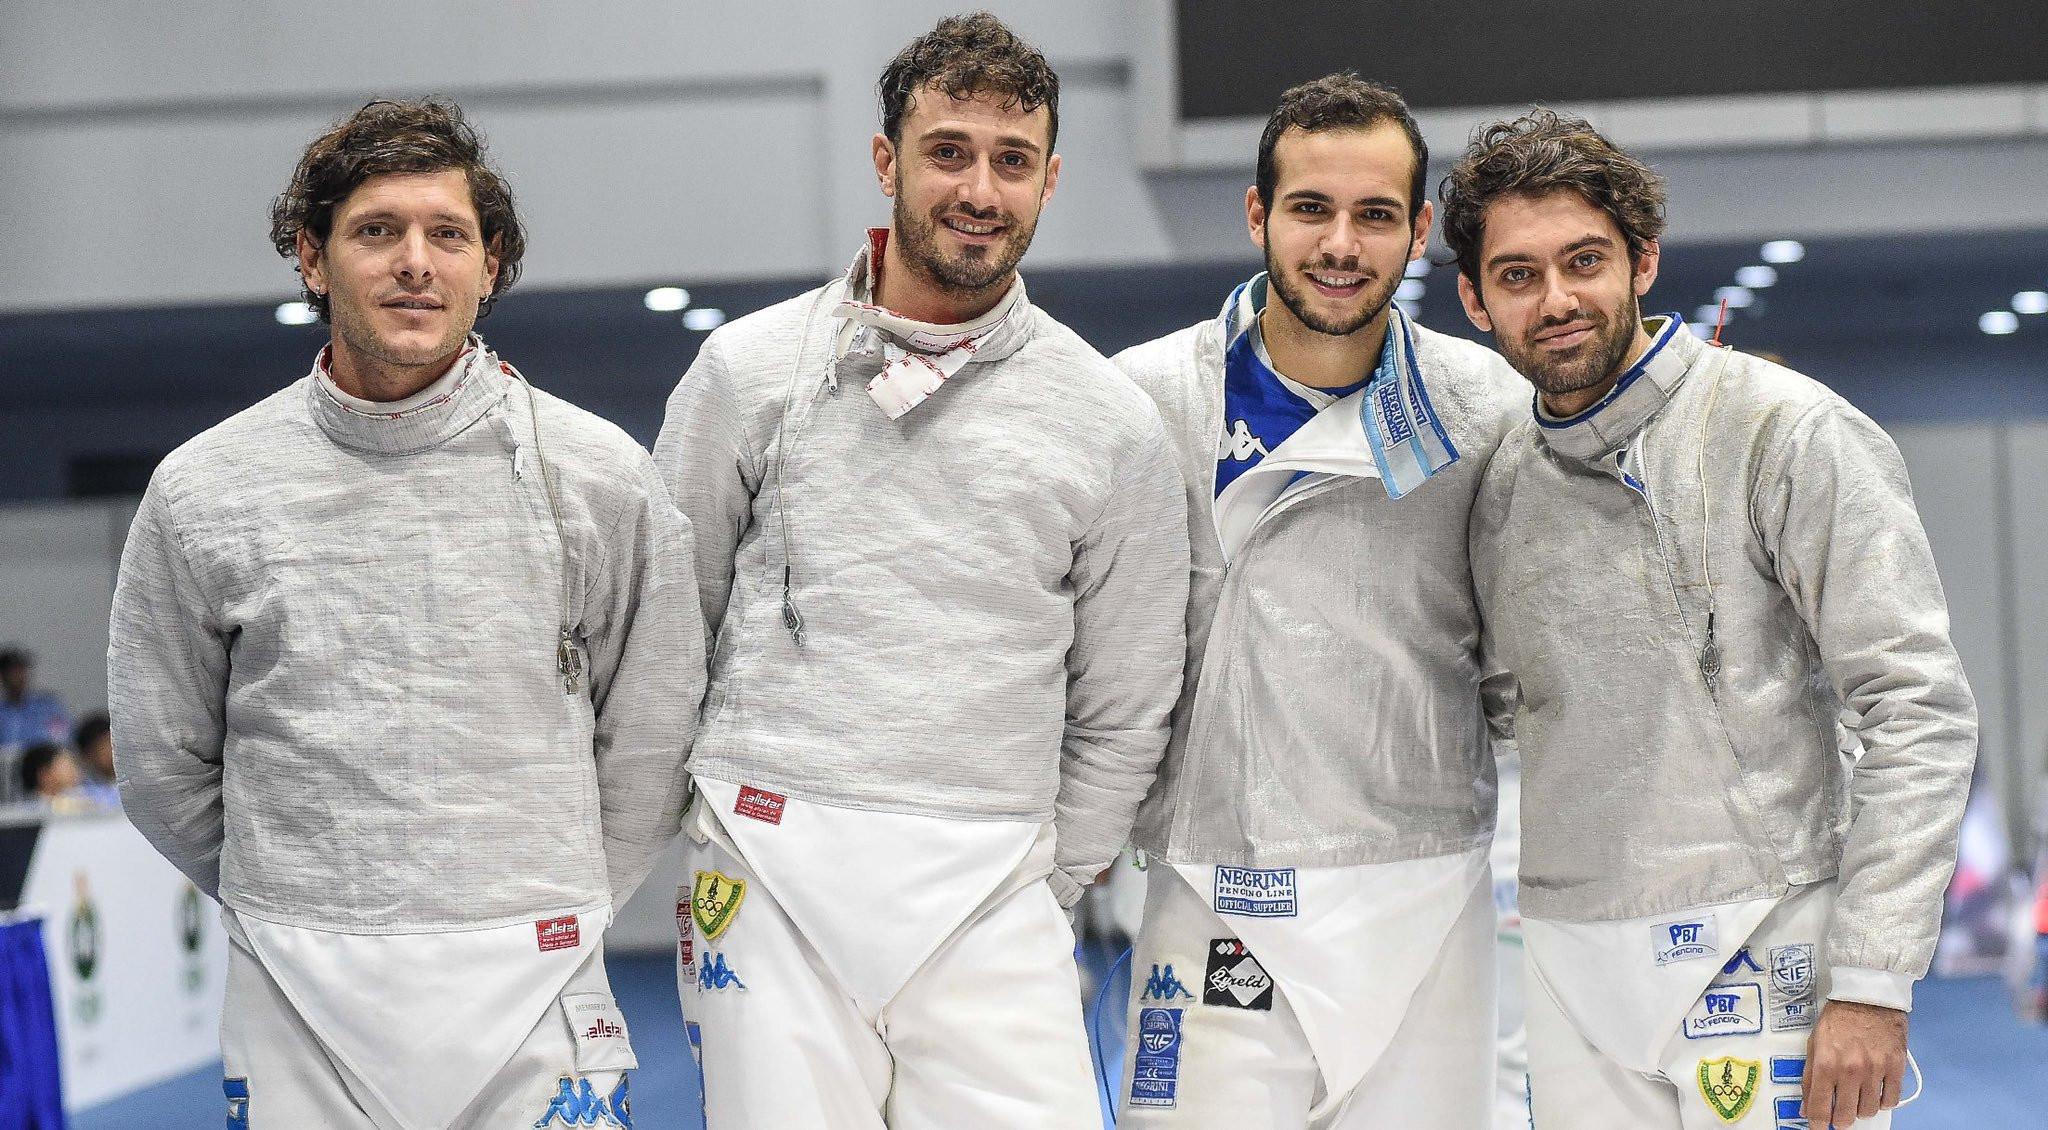 The Italian team of Enrico Berre, Luca Curatoli, Aldo Montano and Luigi Samuele defeated Russia to claim bronze in Cairo ©Italian Fencing Federation